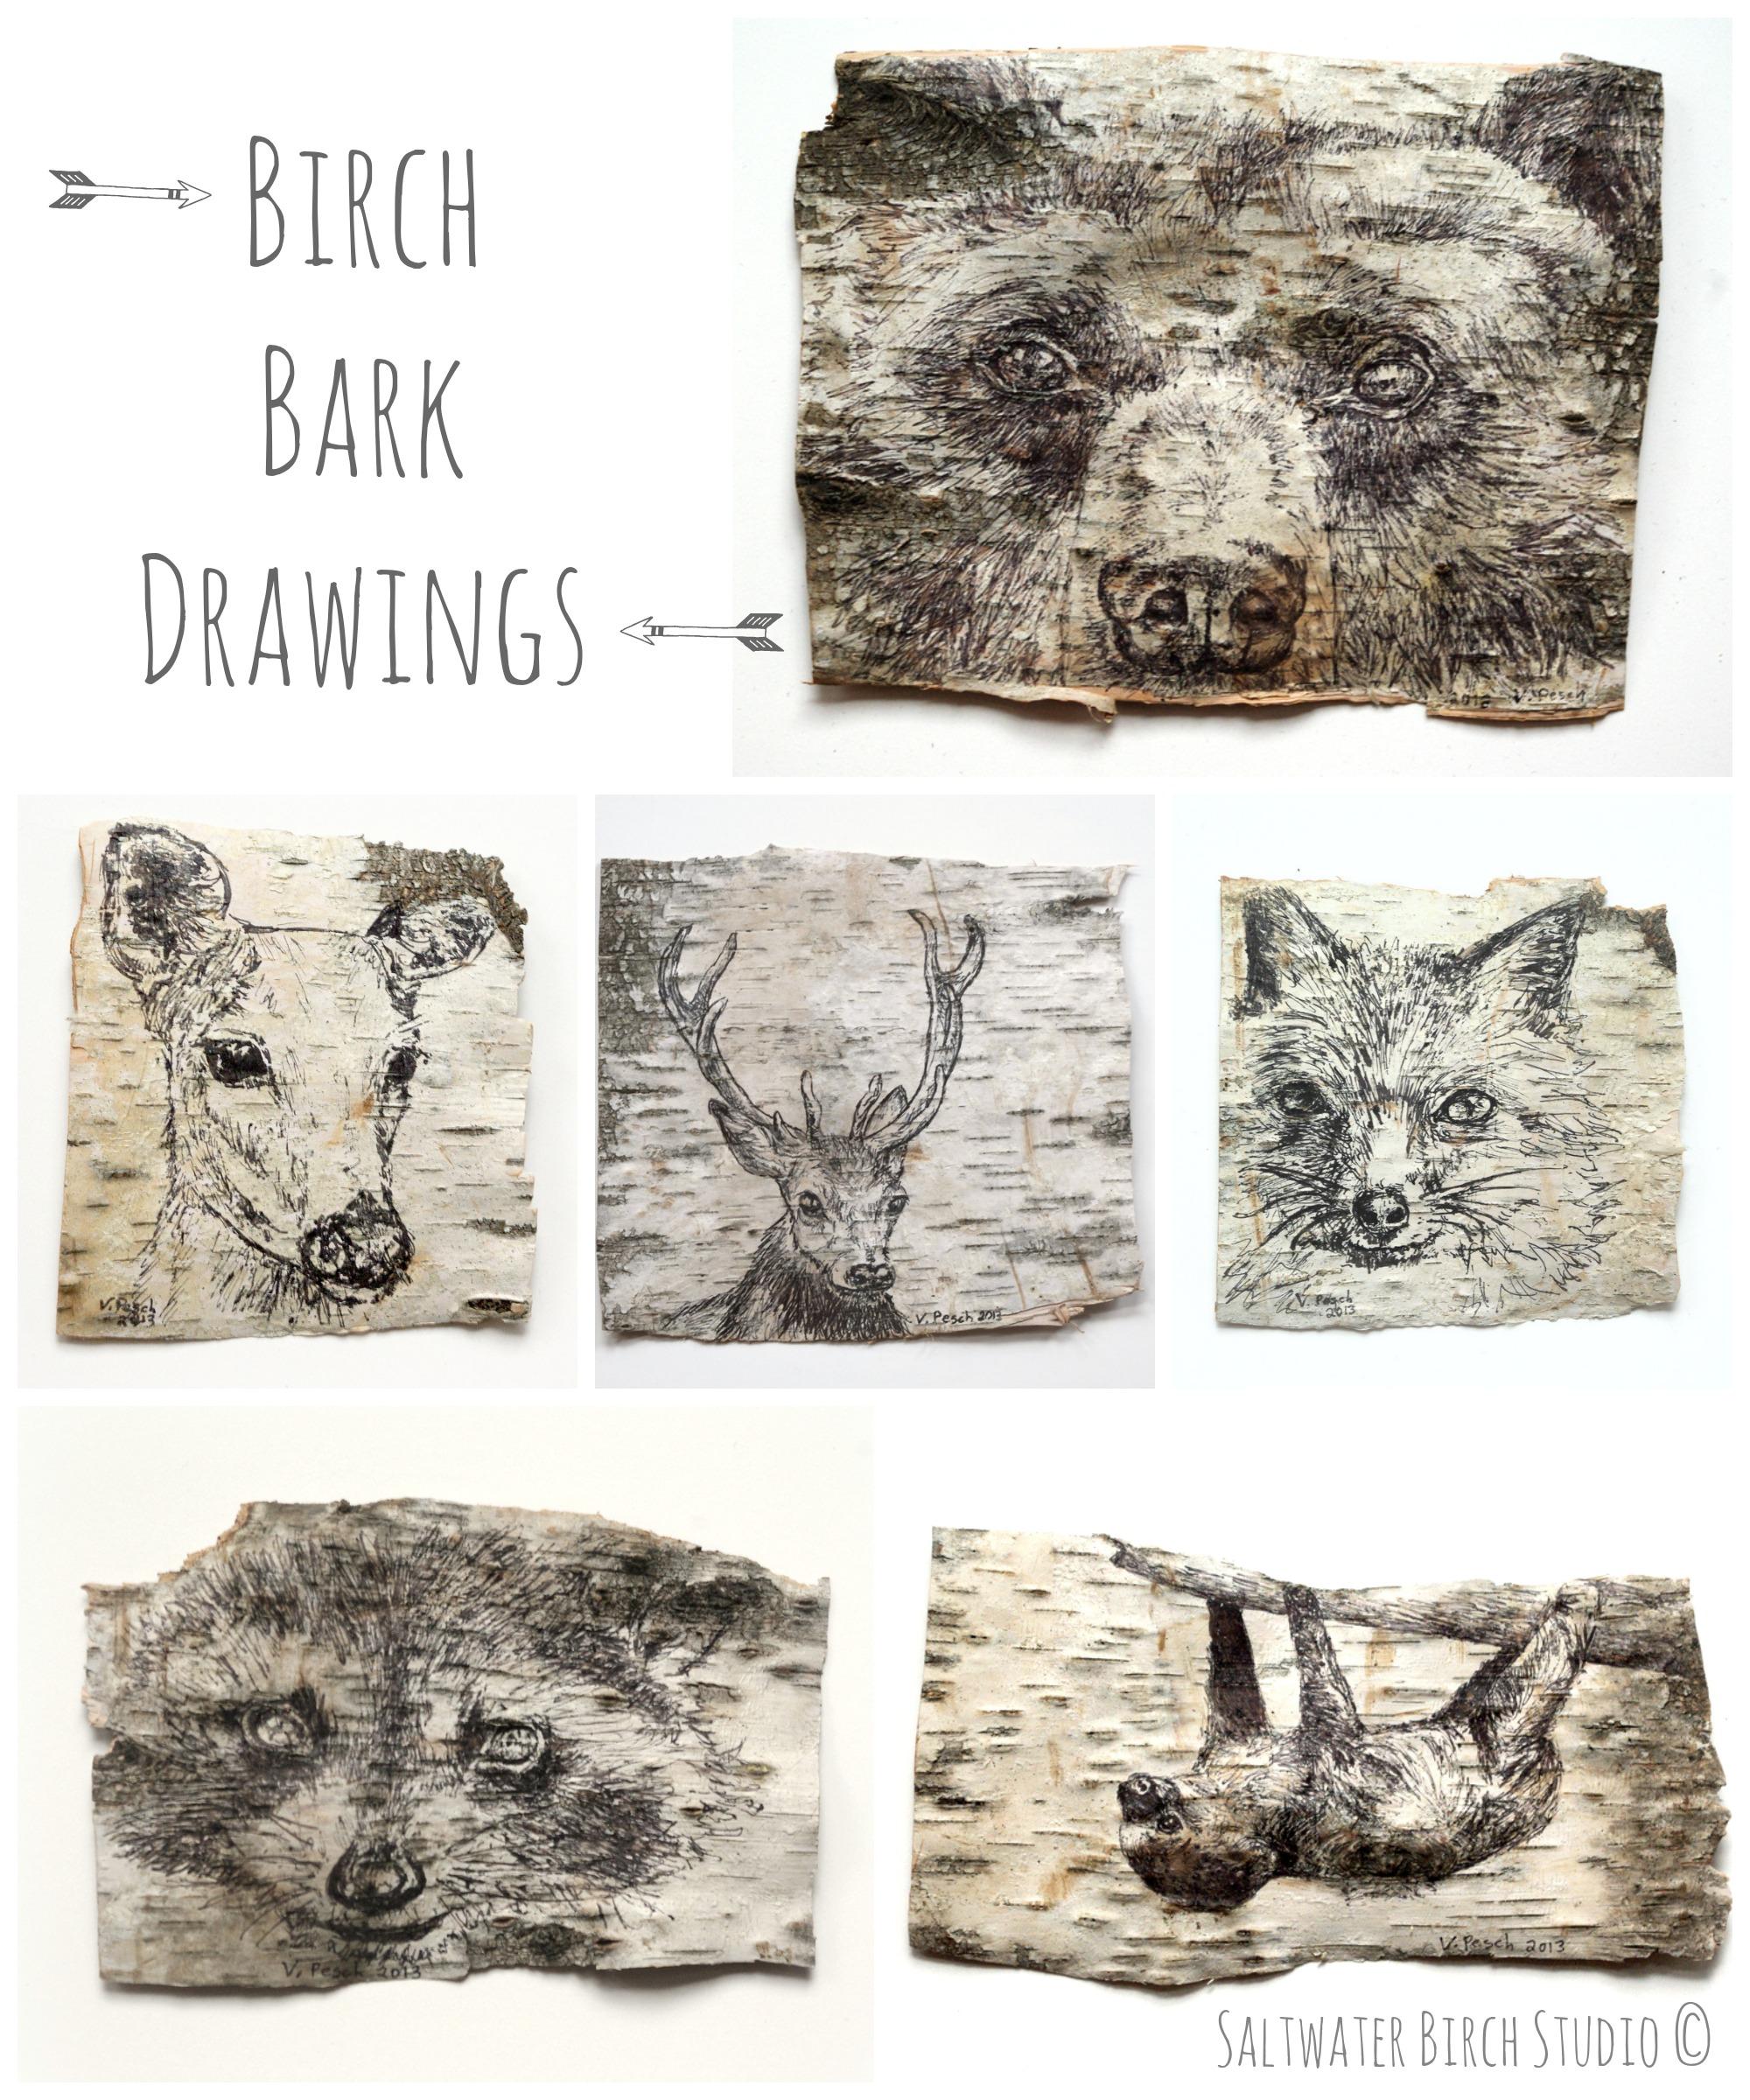 2000x2400 Birch Bark Art Saltwater Birch Studio